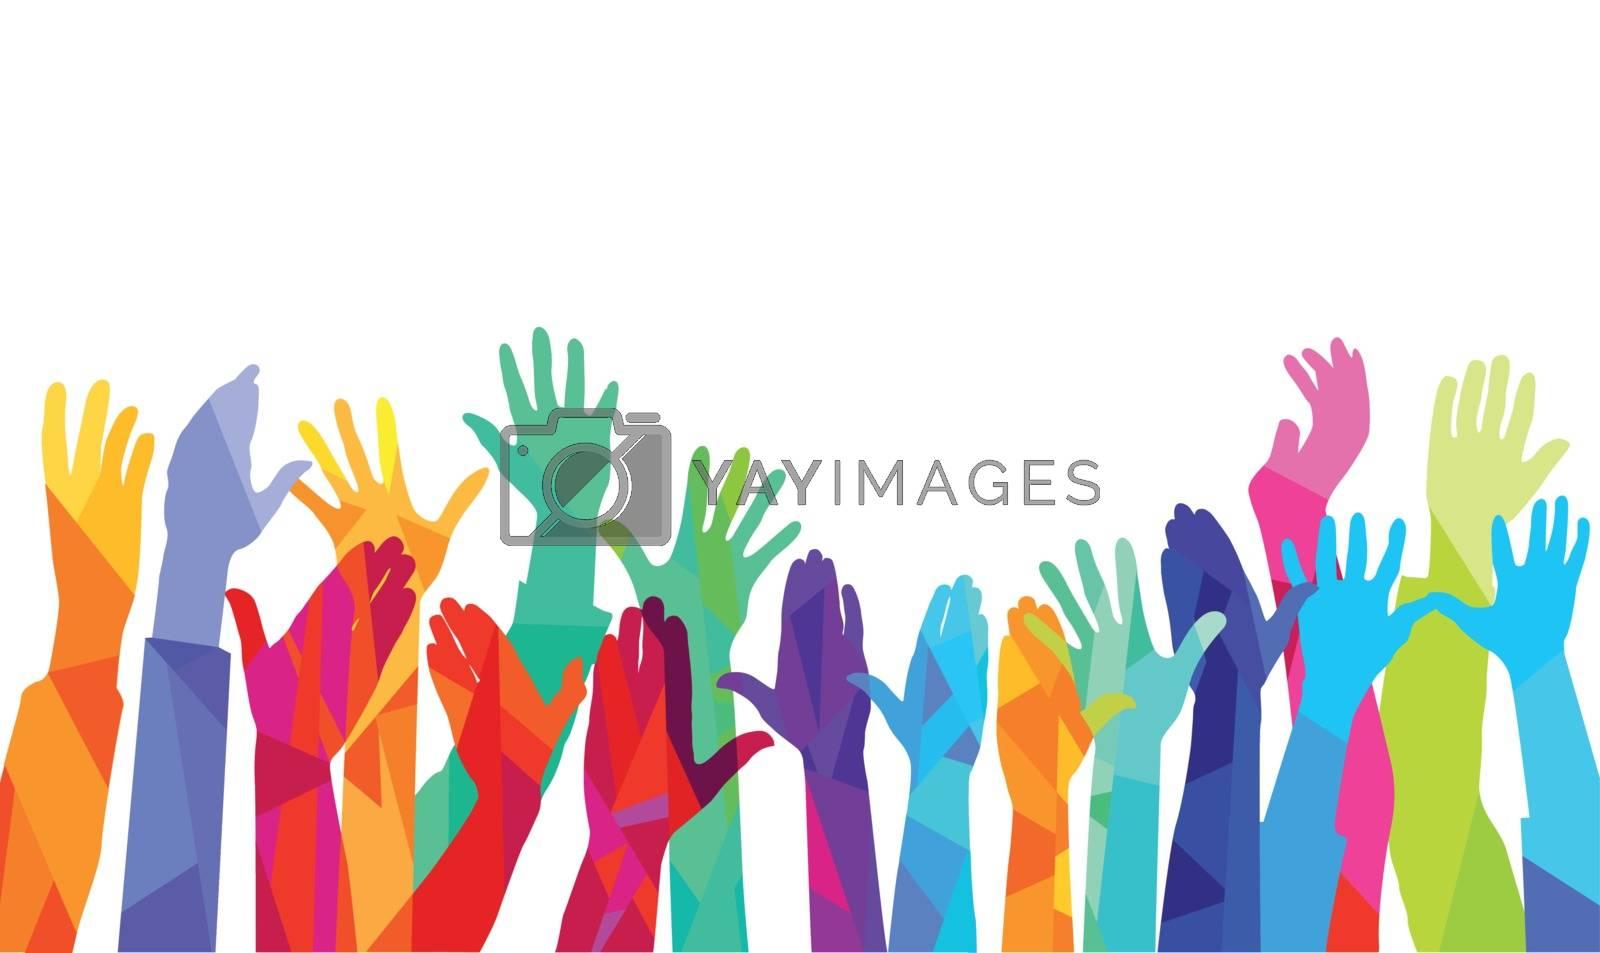 Hands up, colorful illustration